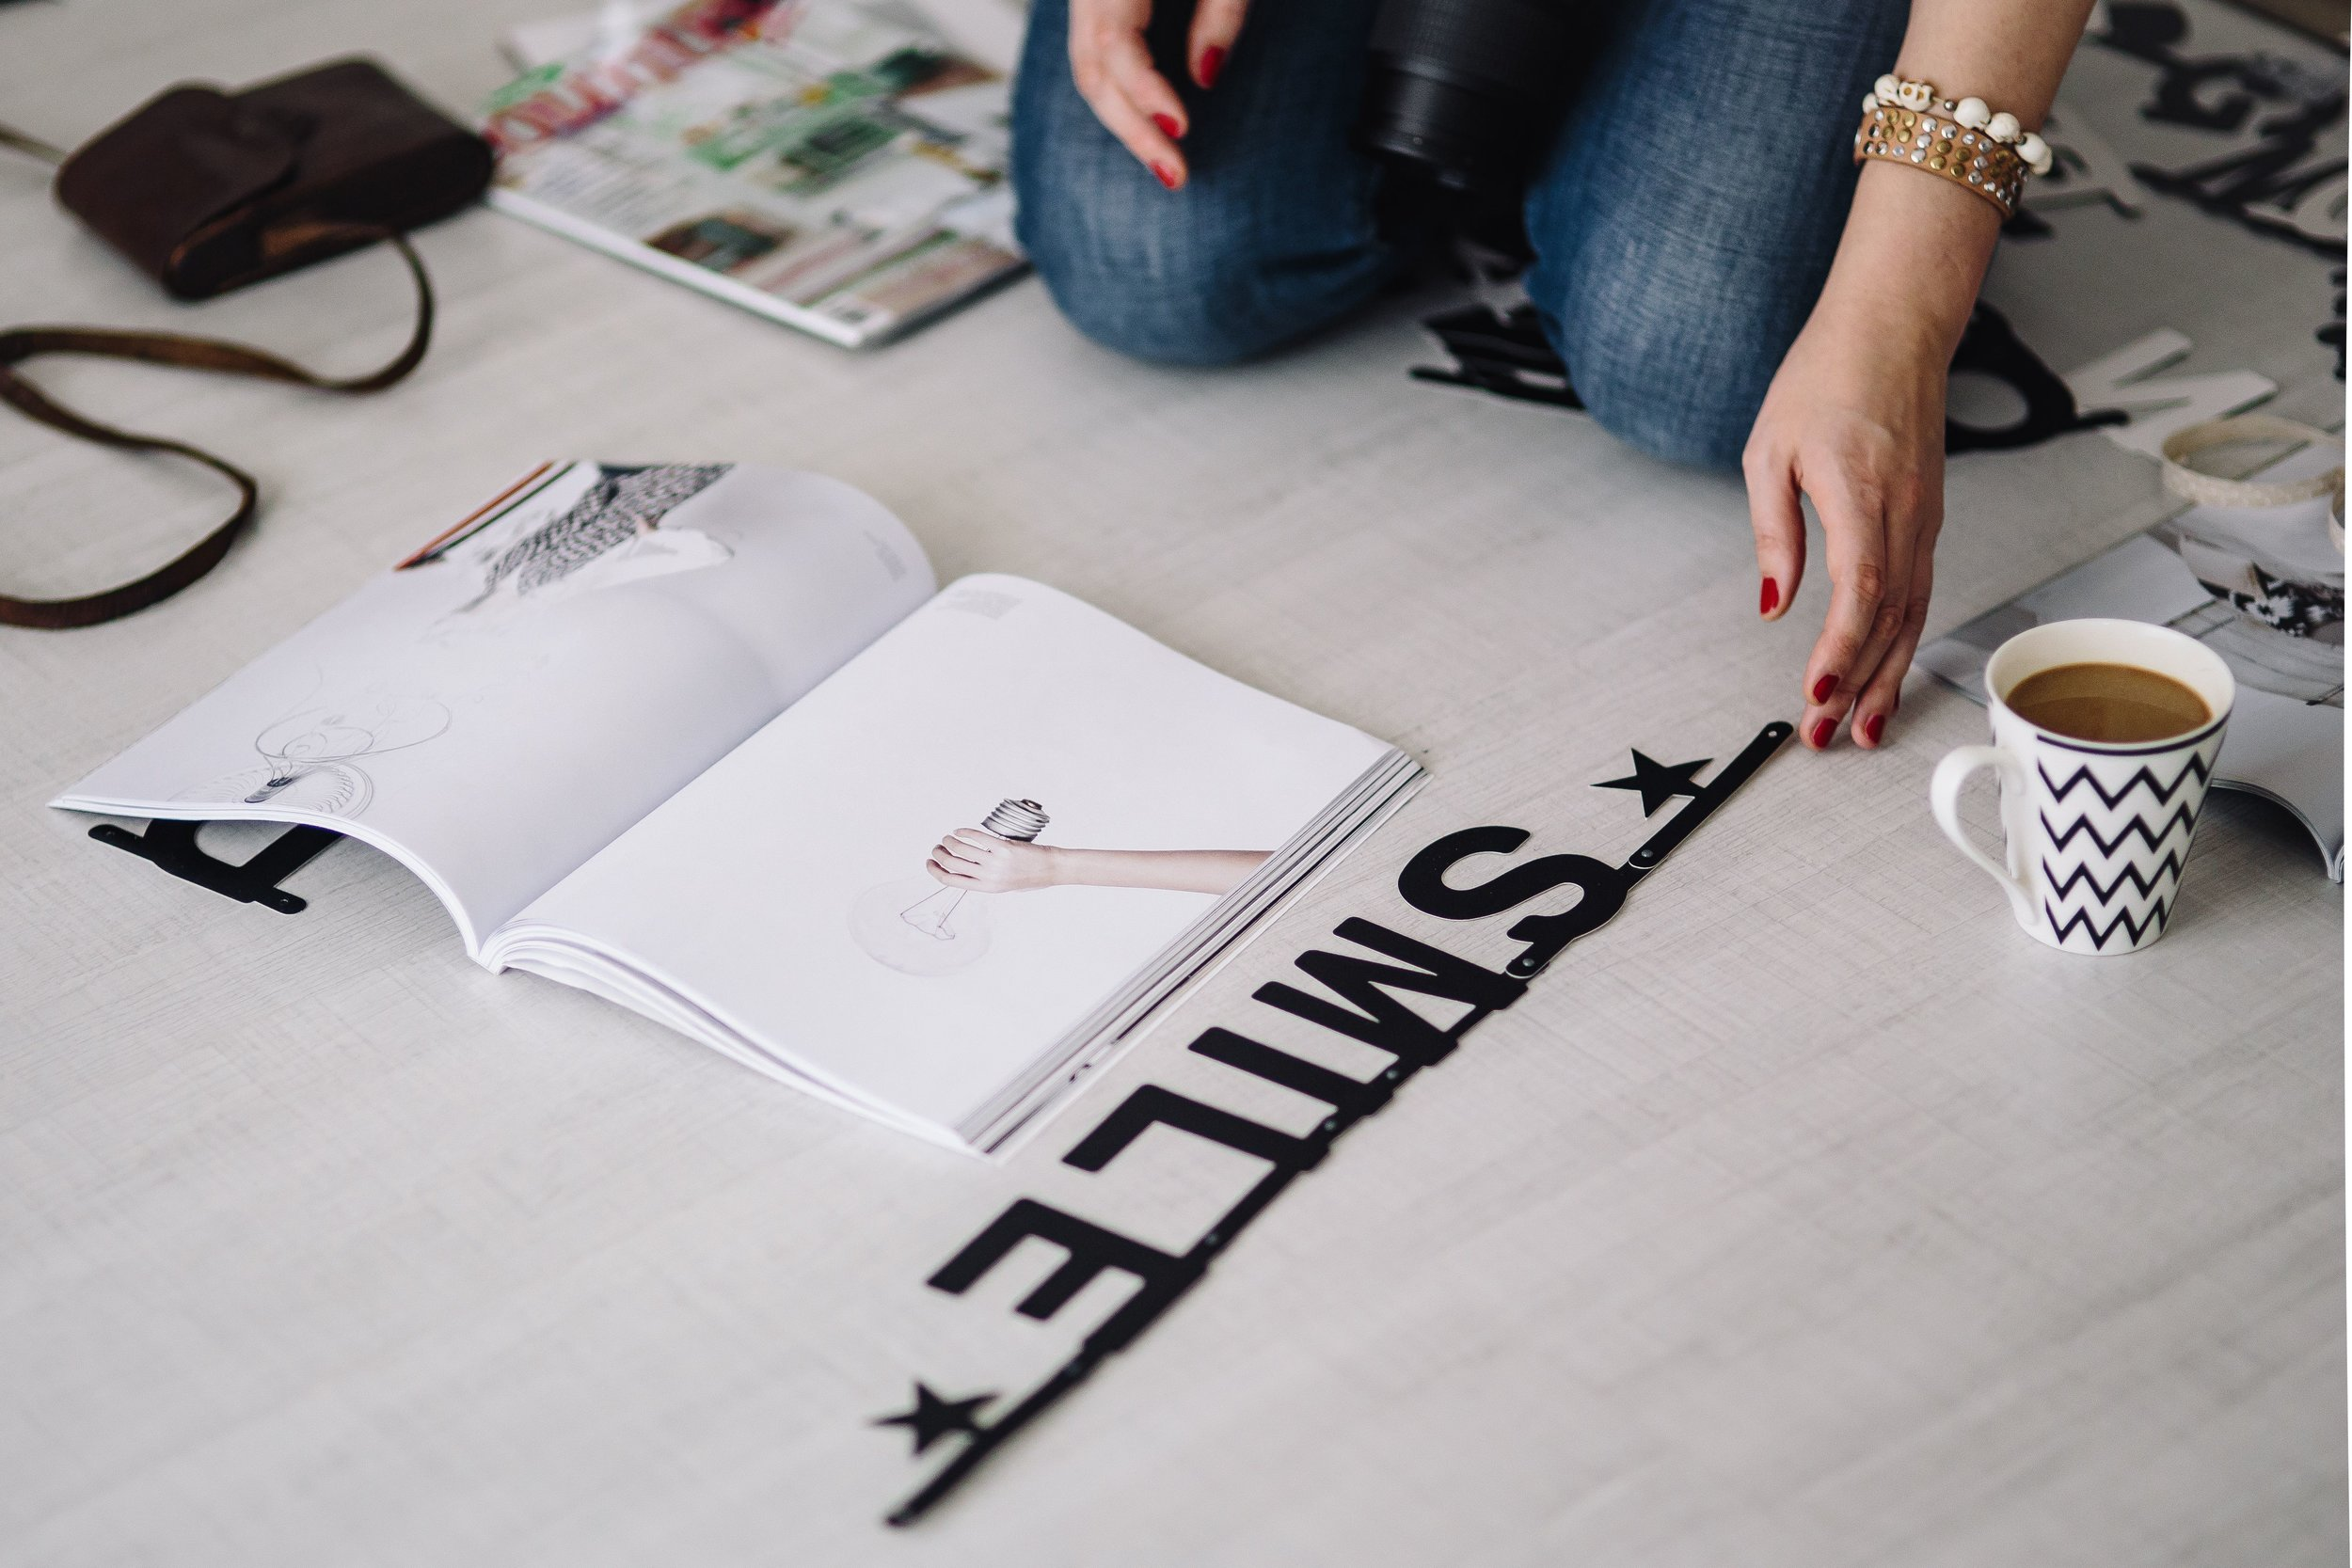 kaboompics_Woman arranging scrambled letters.jpg